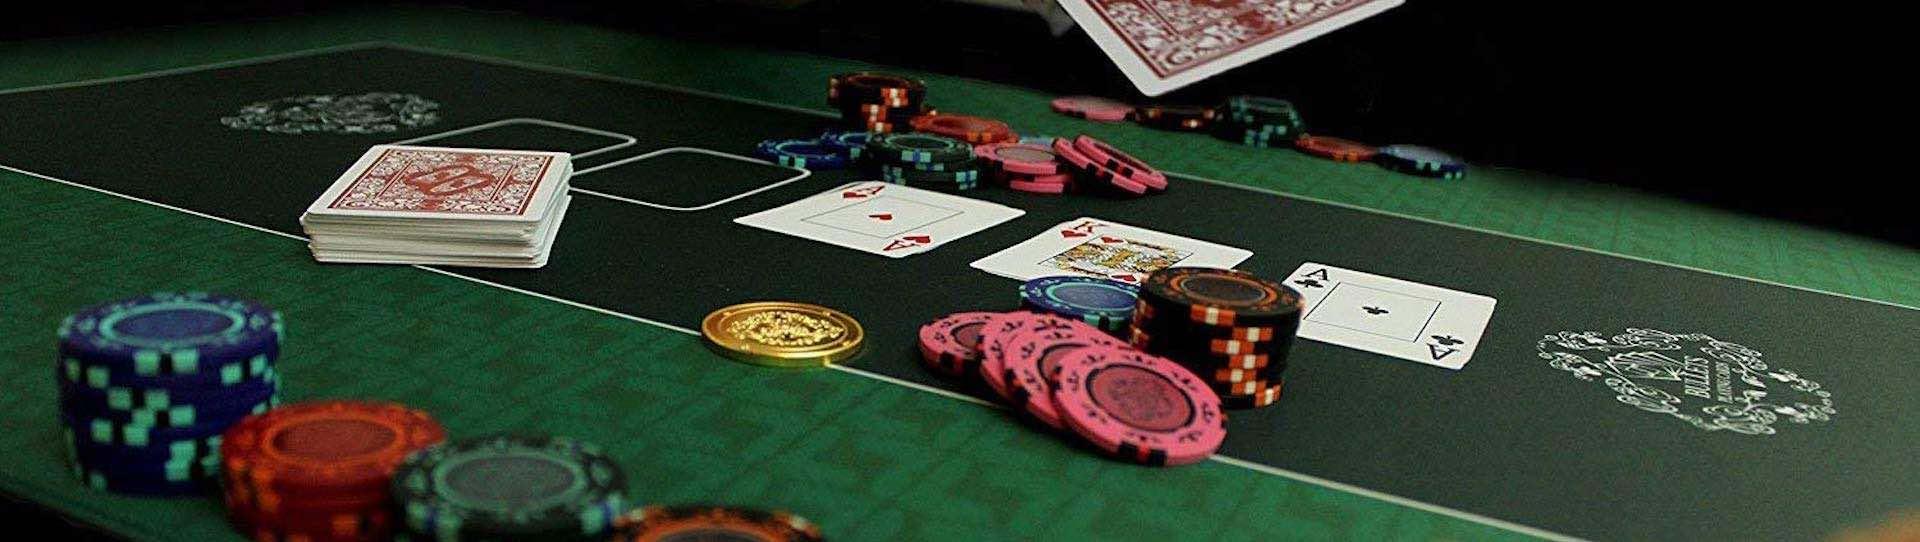 Buy Poker Table Brisbane